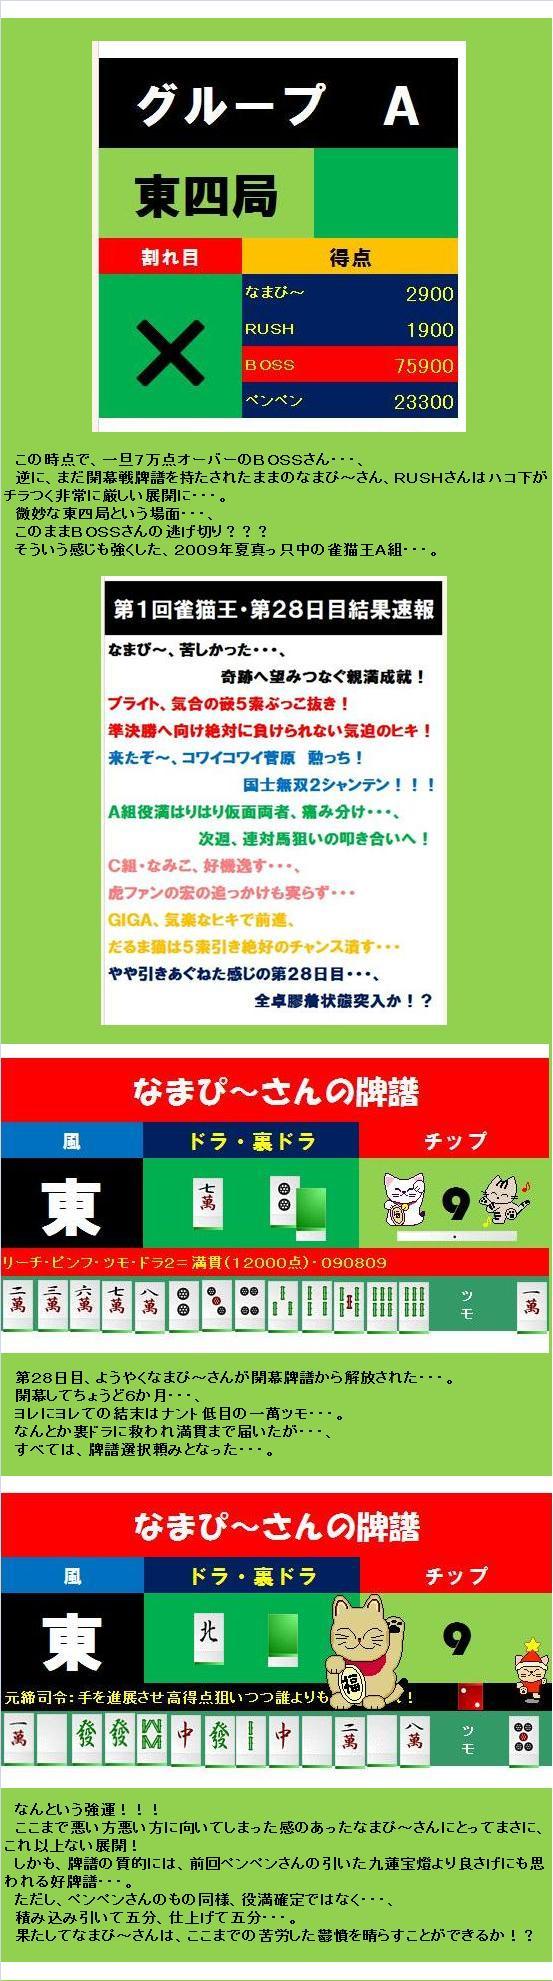 20100226・A組回顧13.jpg